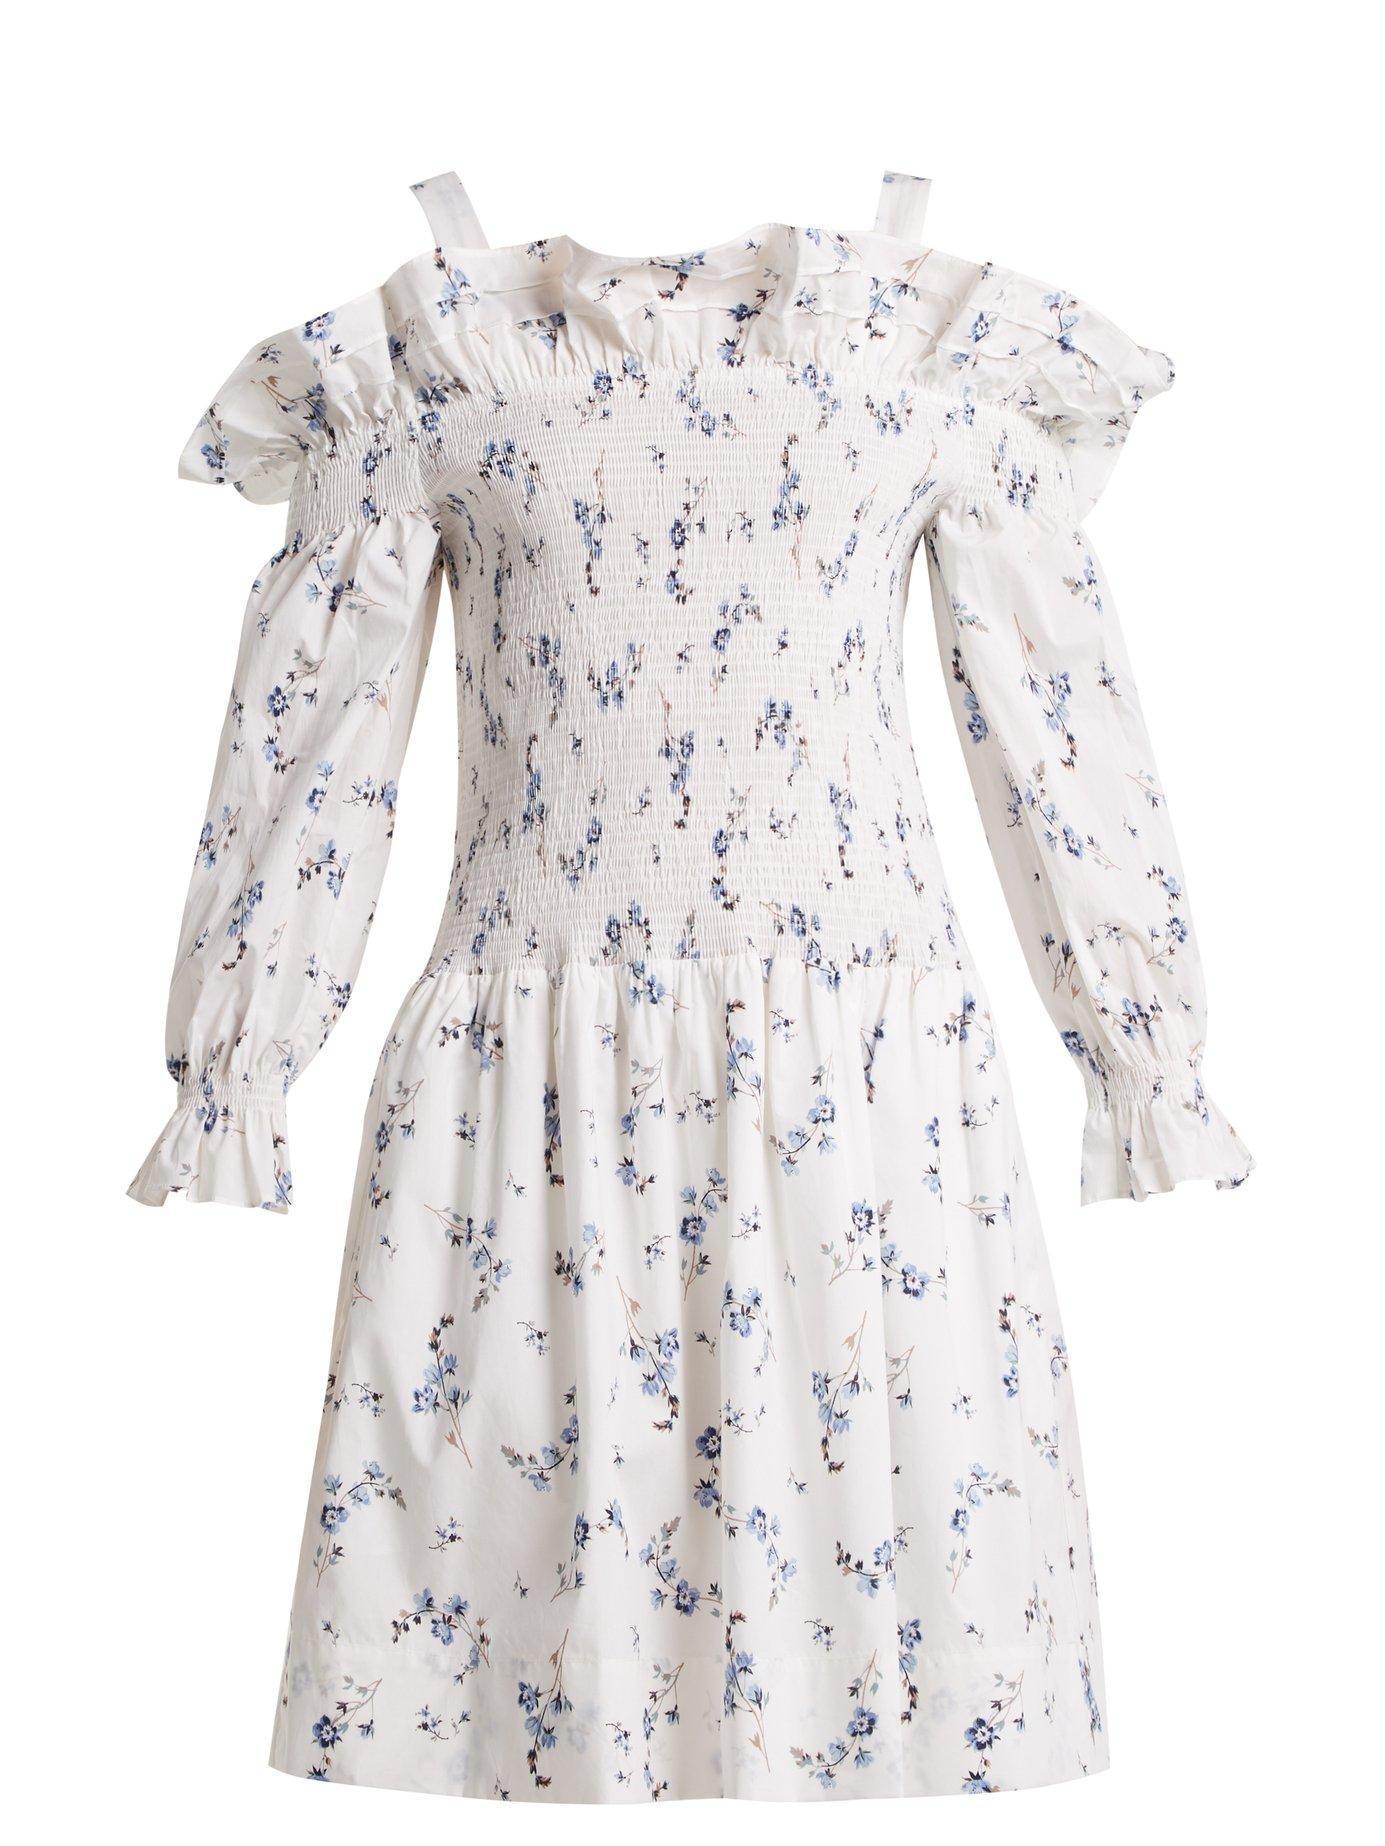 6a6210e65e Rebecca Taylor Francine Off-The-Shoulder Floral-Print Dress In White Print